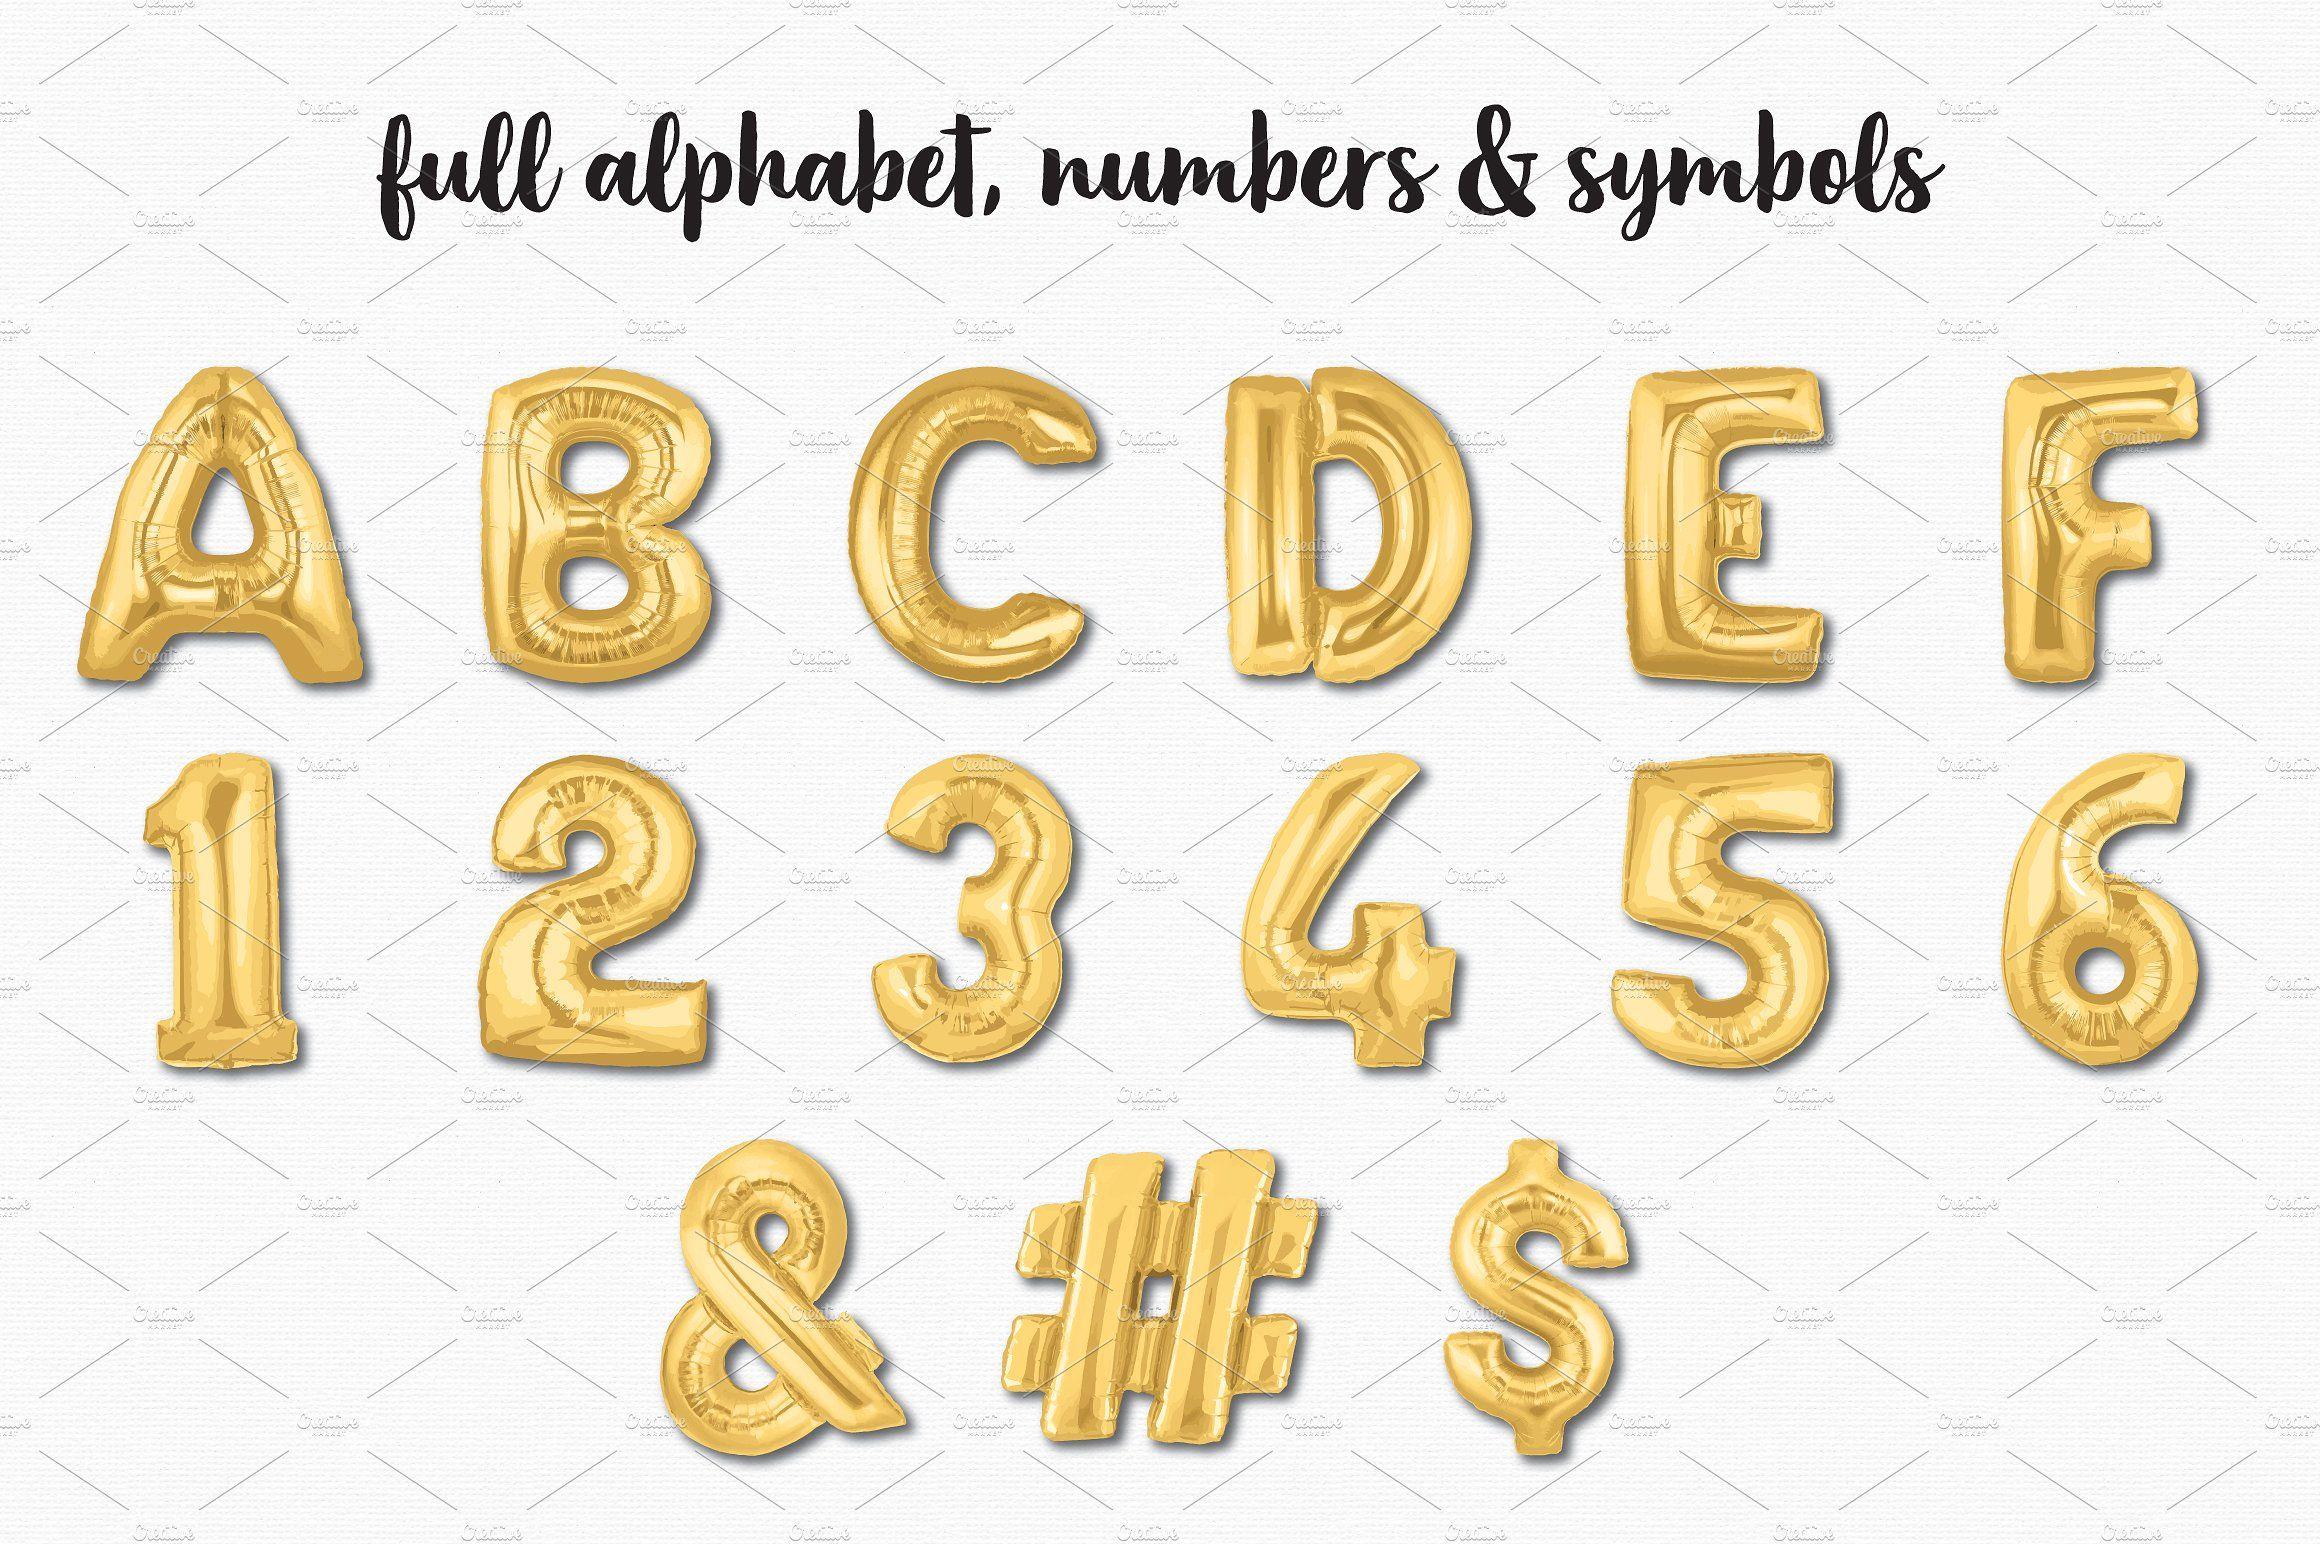 Gold Foil Balloon Bundle #popular#super#numeric#alpha.